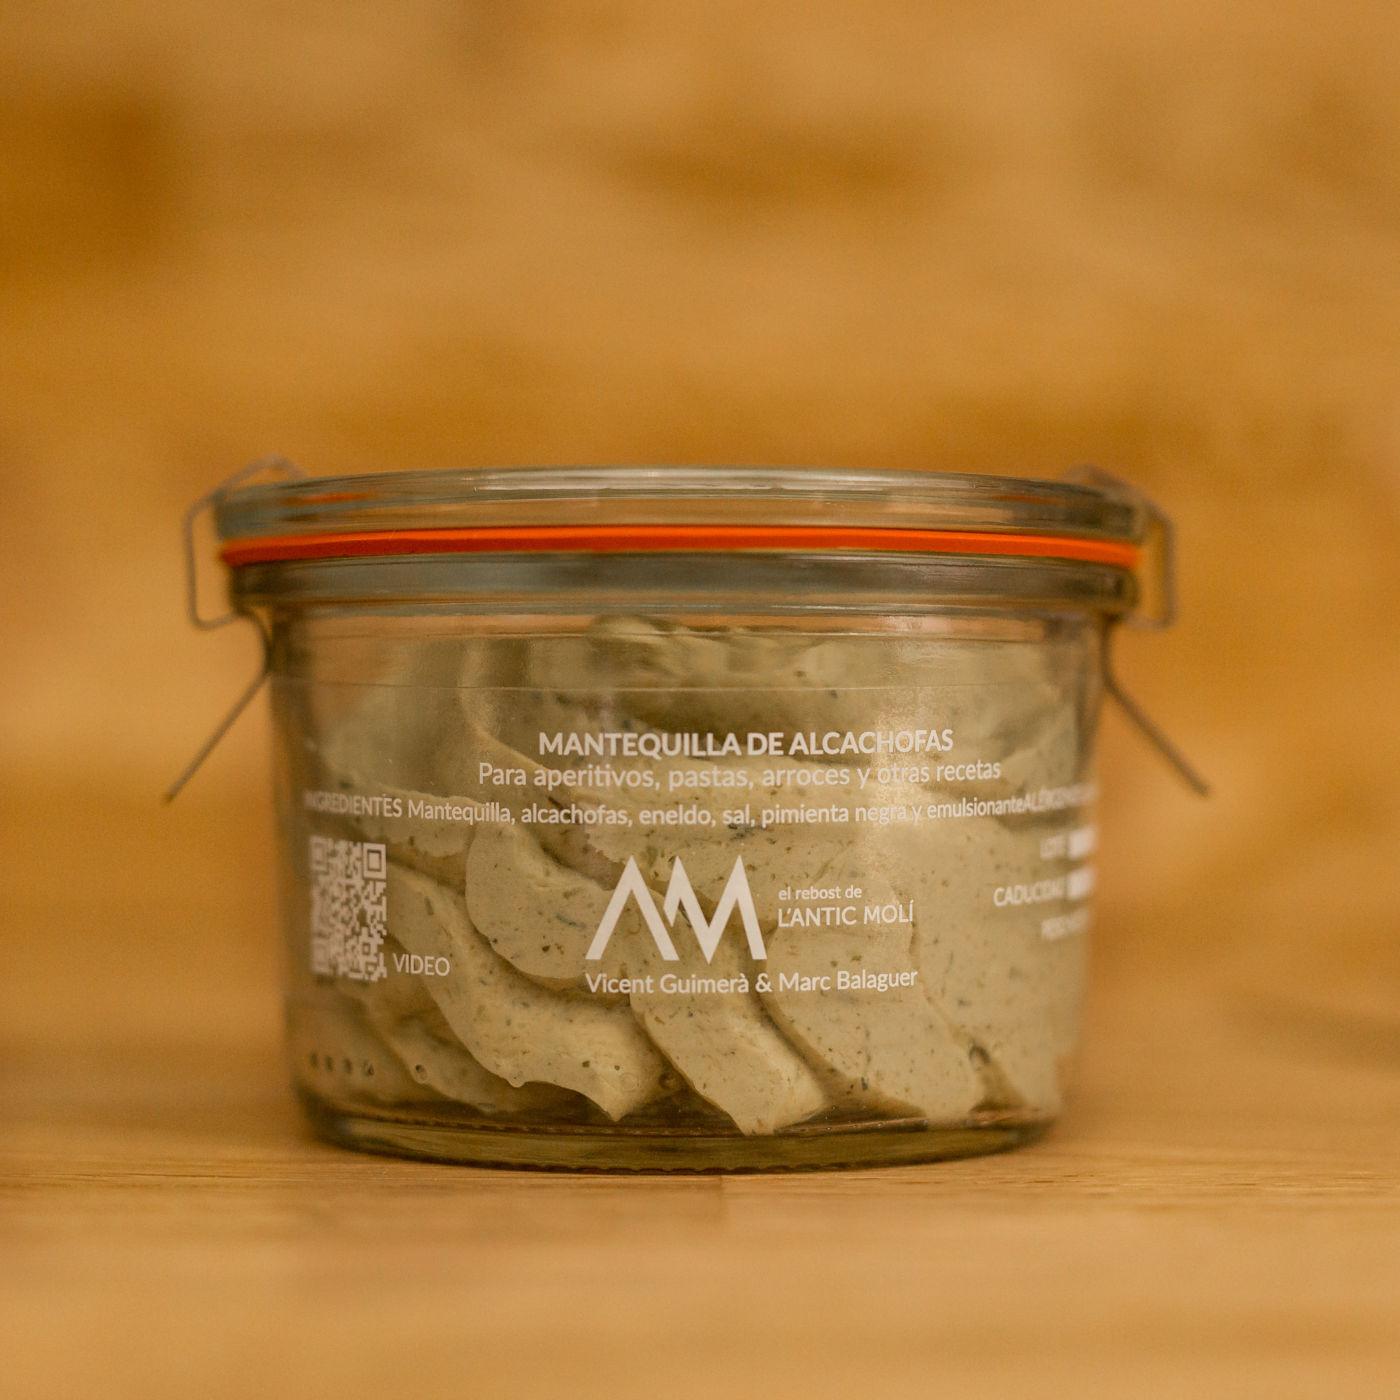 mantequilla de alcachofas-rebost antic moli